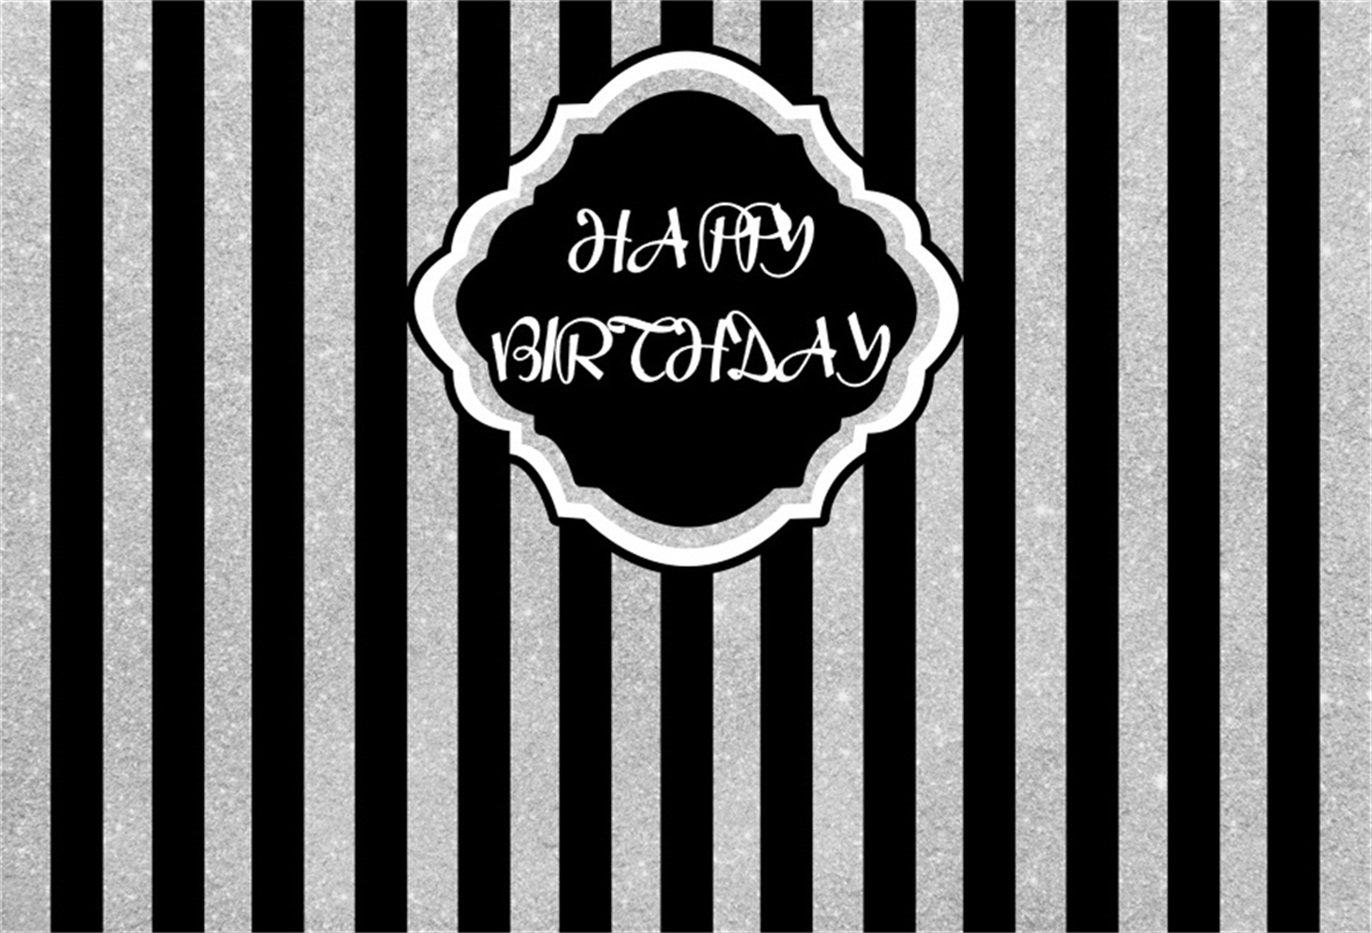 Csfoto 7x5ft happy birthday black and white vertical stripes background birthday party decoration photography backdrop photo studio props kid newborn